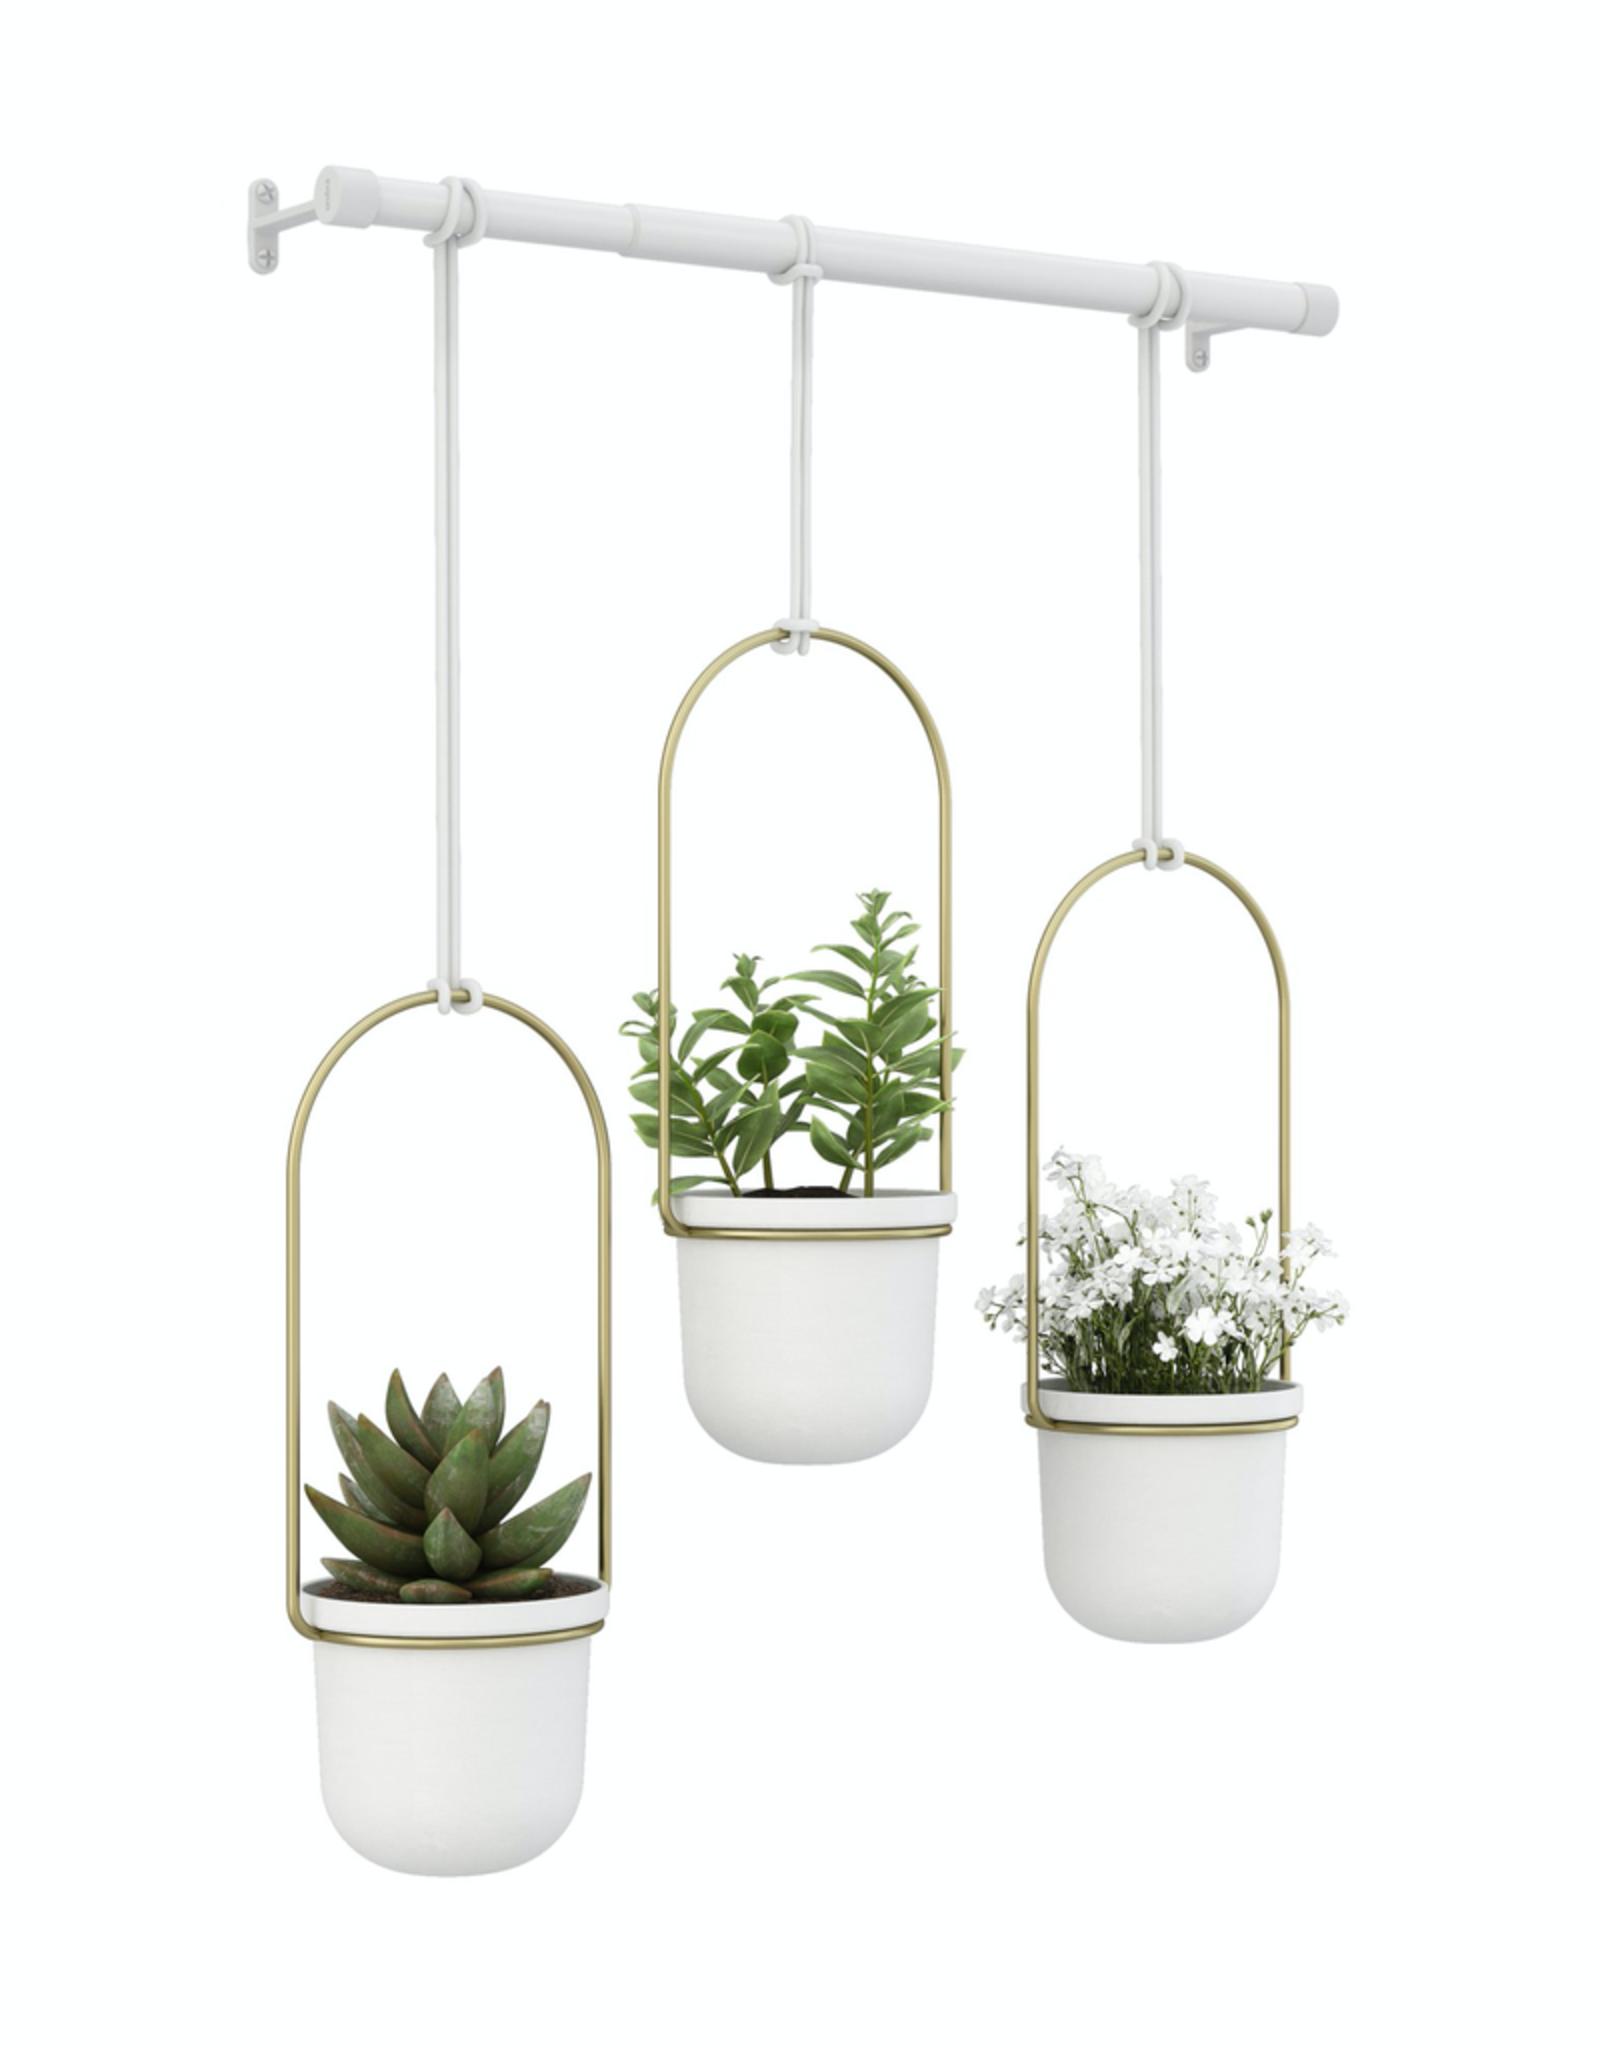 Triflora Hanging Planter White/Brass